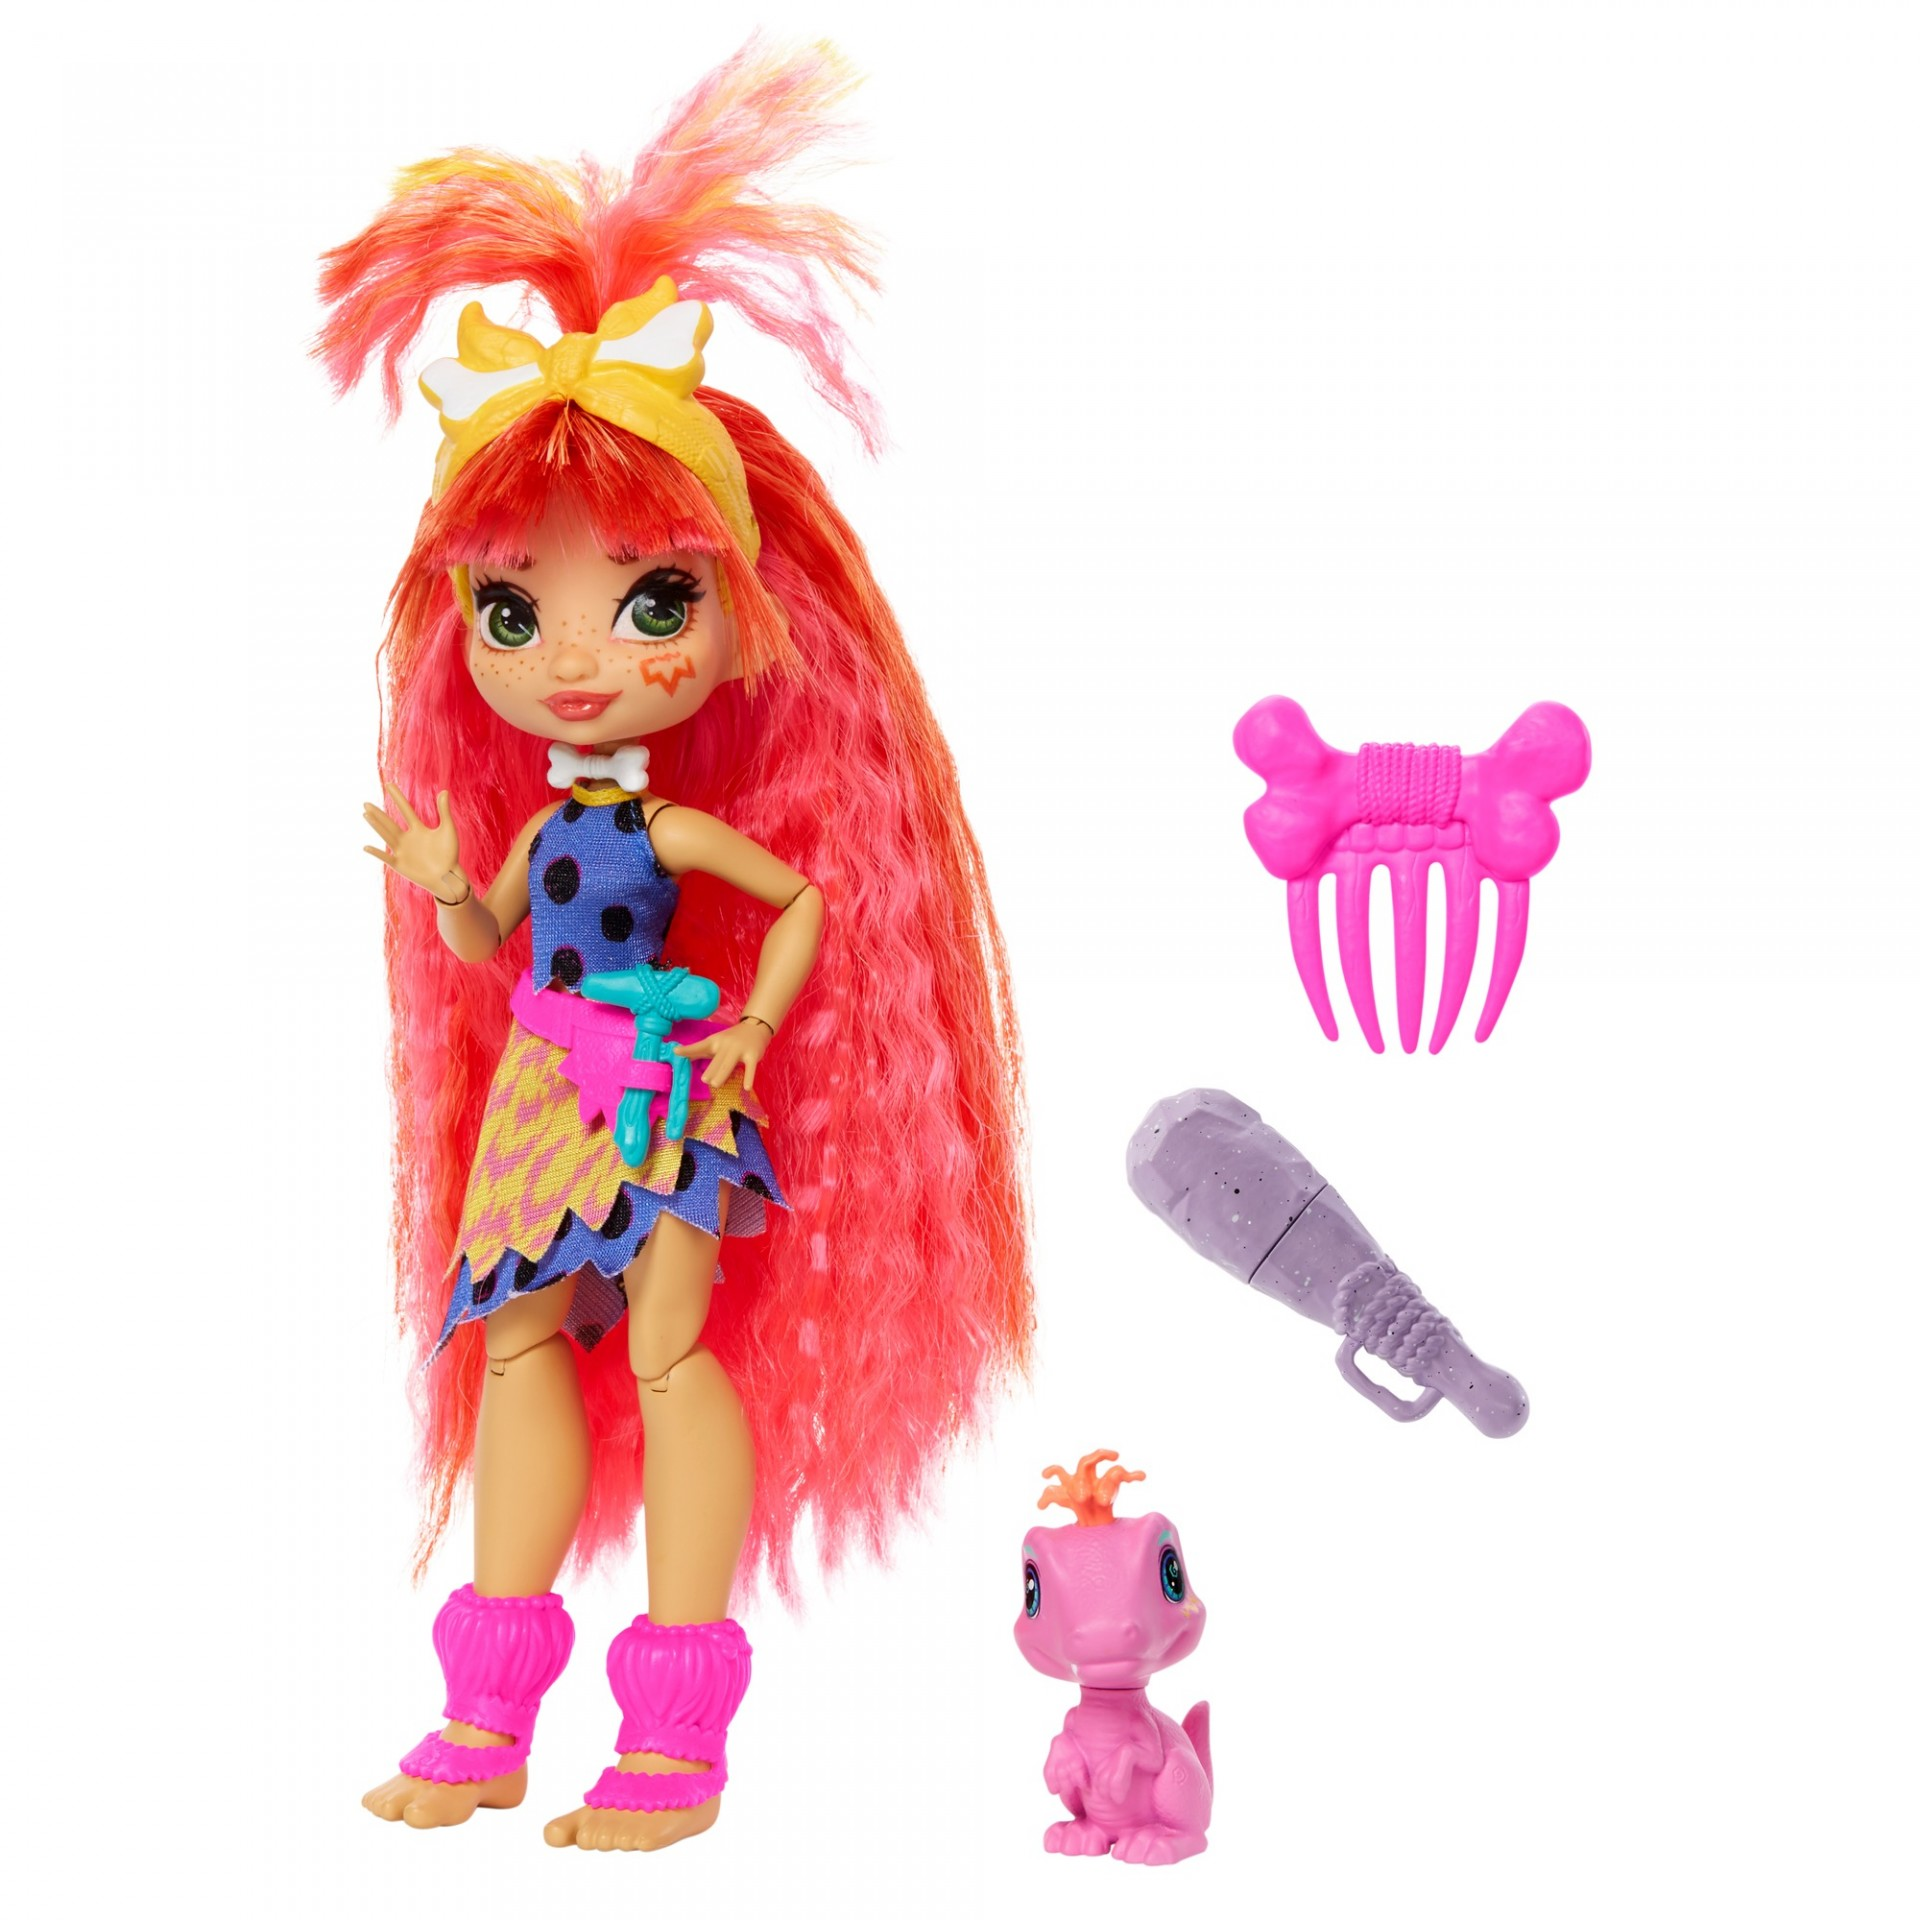 Купить Кукла Эмберли и питомец Флер Пещерный клуб  Cave Club Emberly Doll with Flaire Dinosaur Pet Mattel от